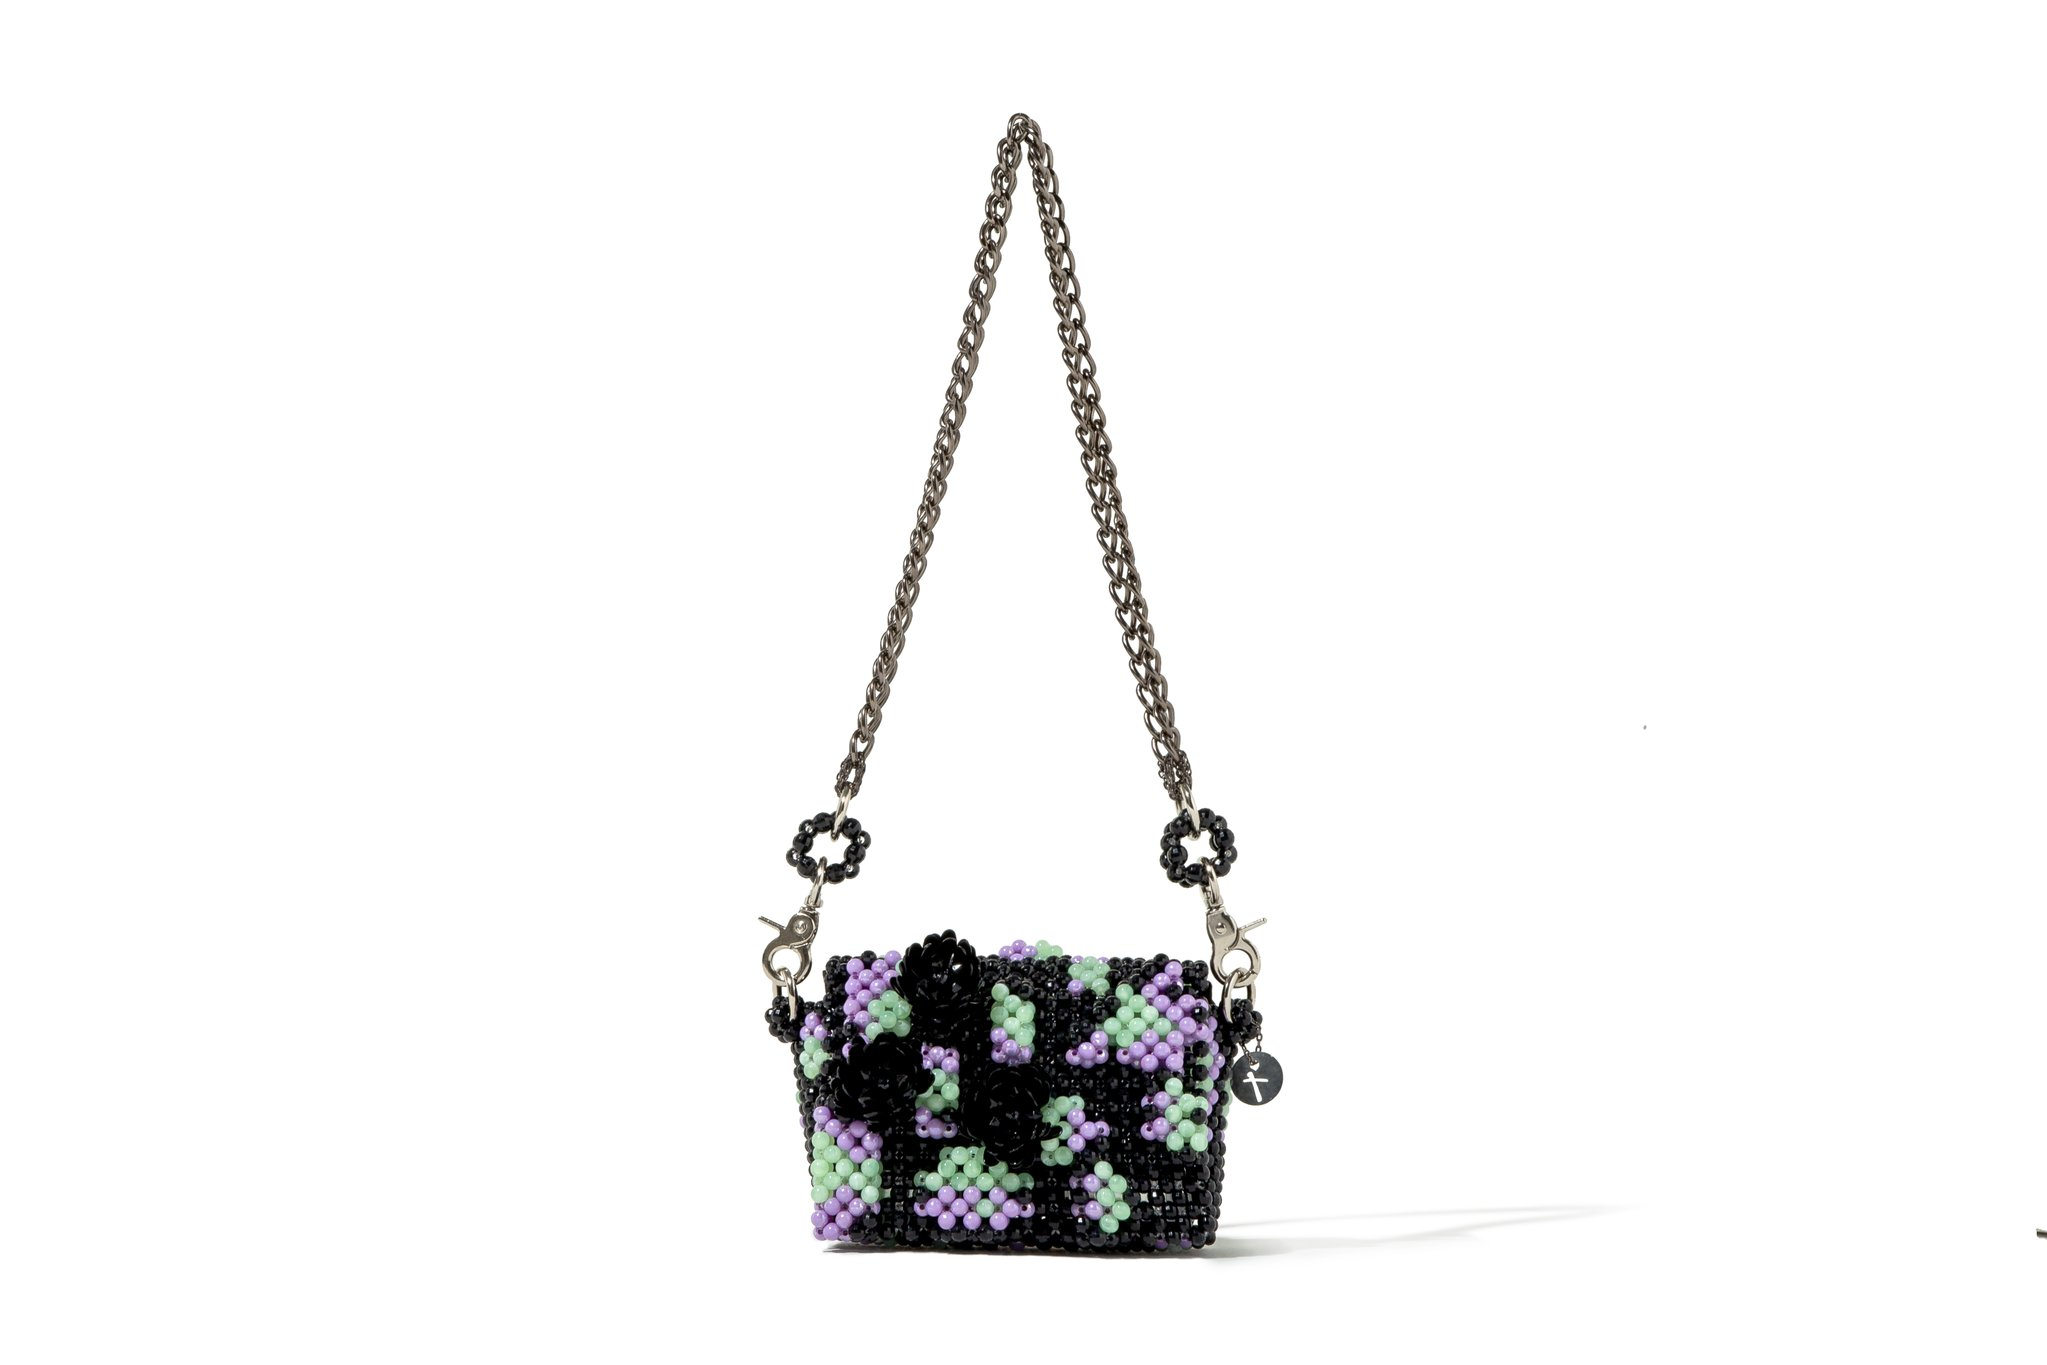 #PopbelaOOTD: Rekomendasi Mini Cross Body Bag